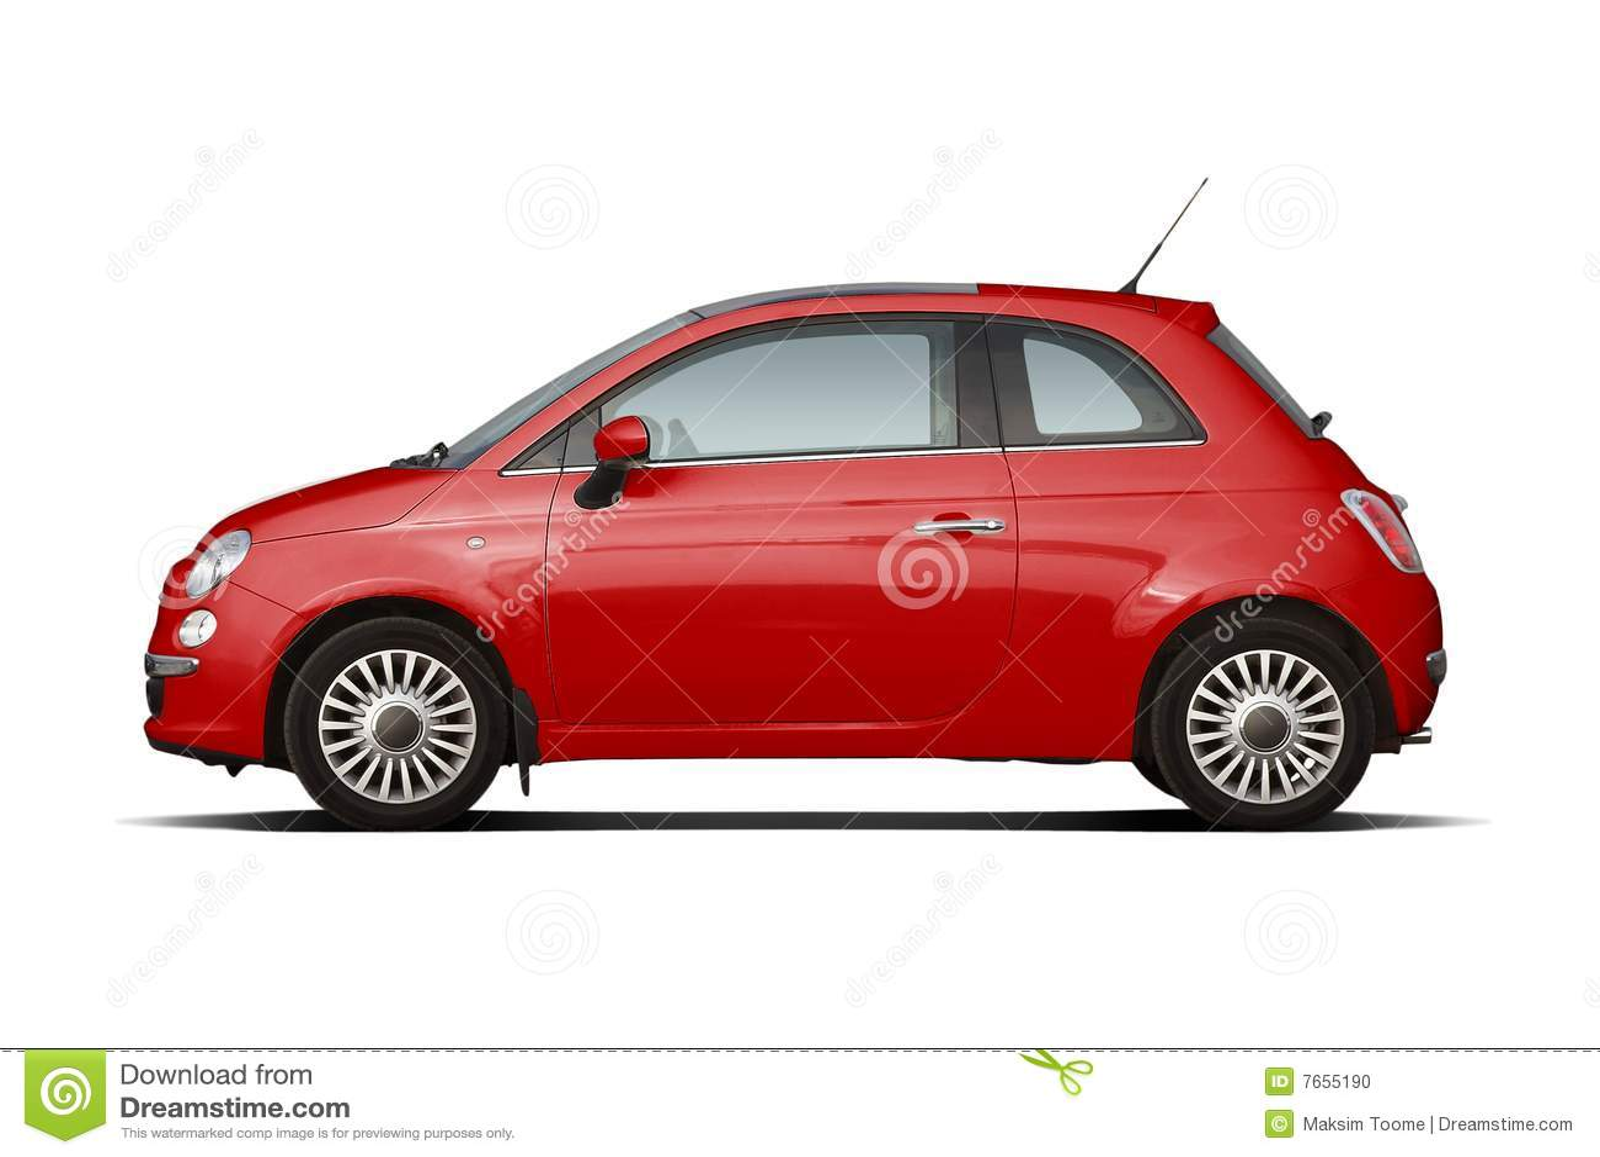 red compact hatchback stock photo image 7655190. Black Bedroom Furniture Sets. Home Design Ideas